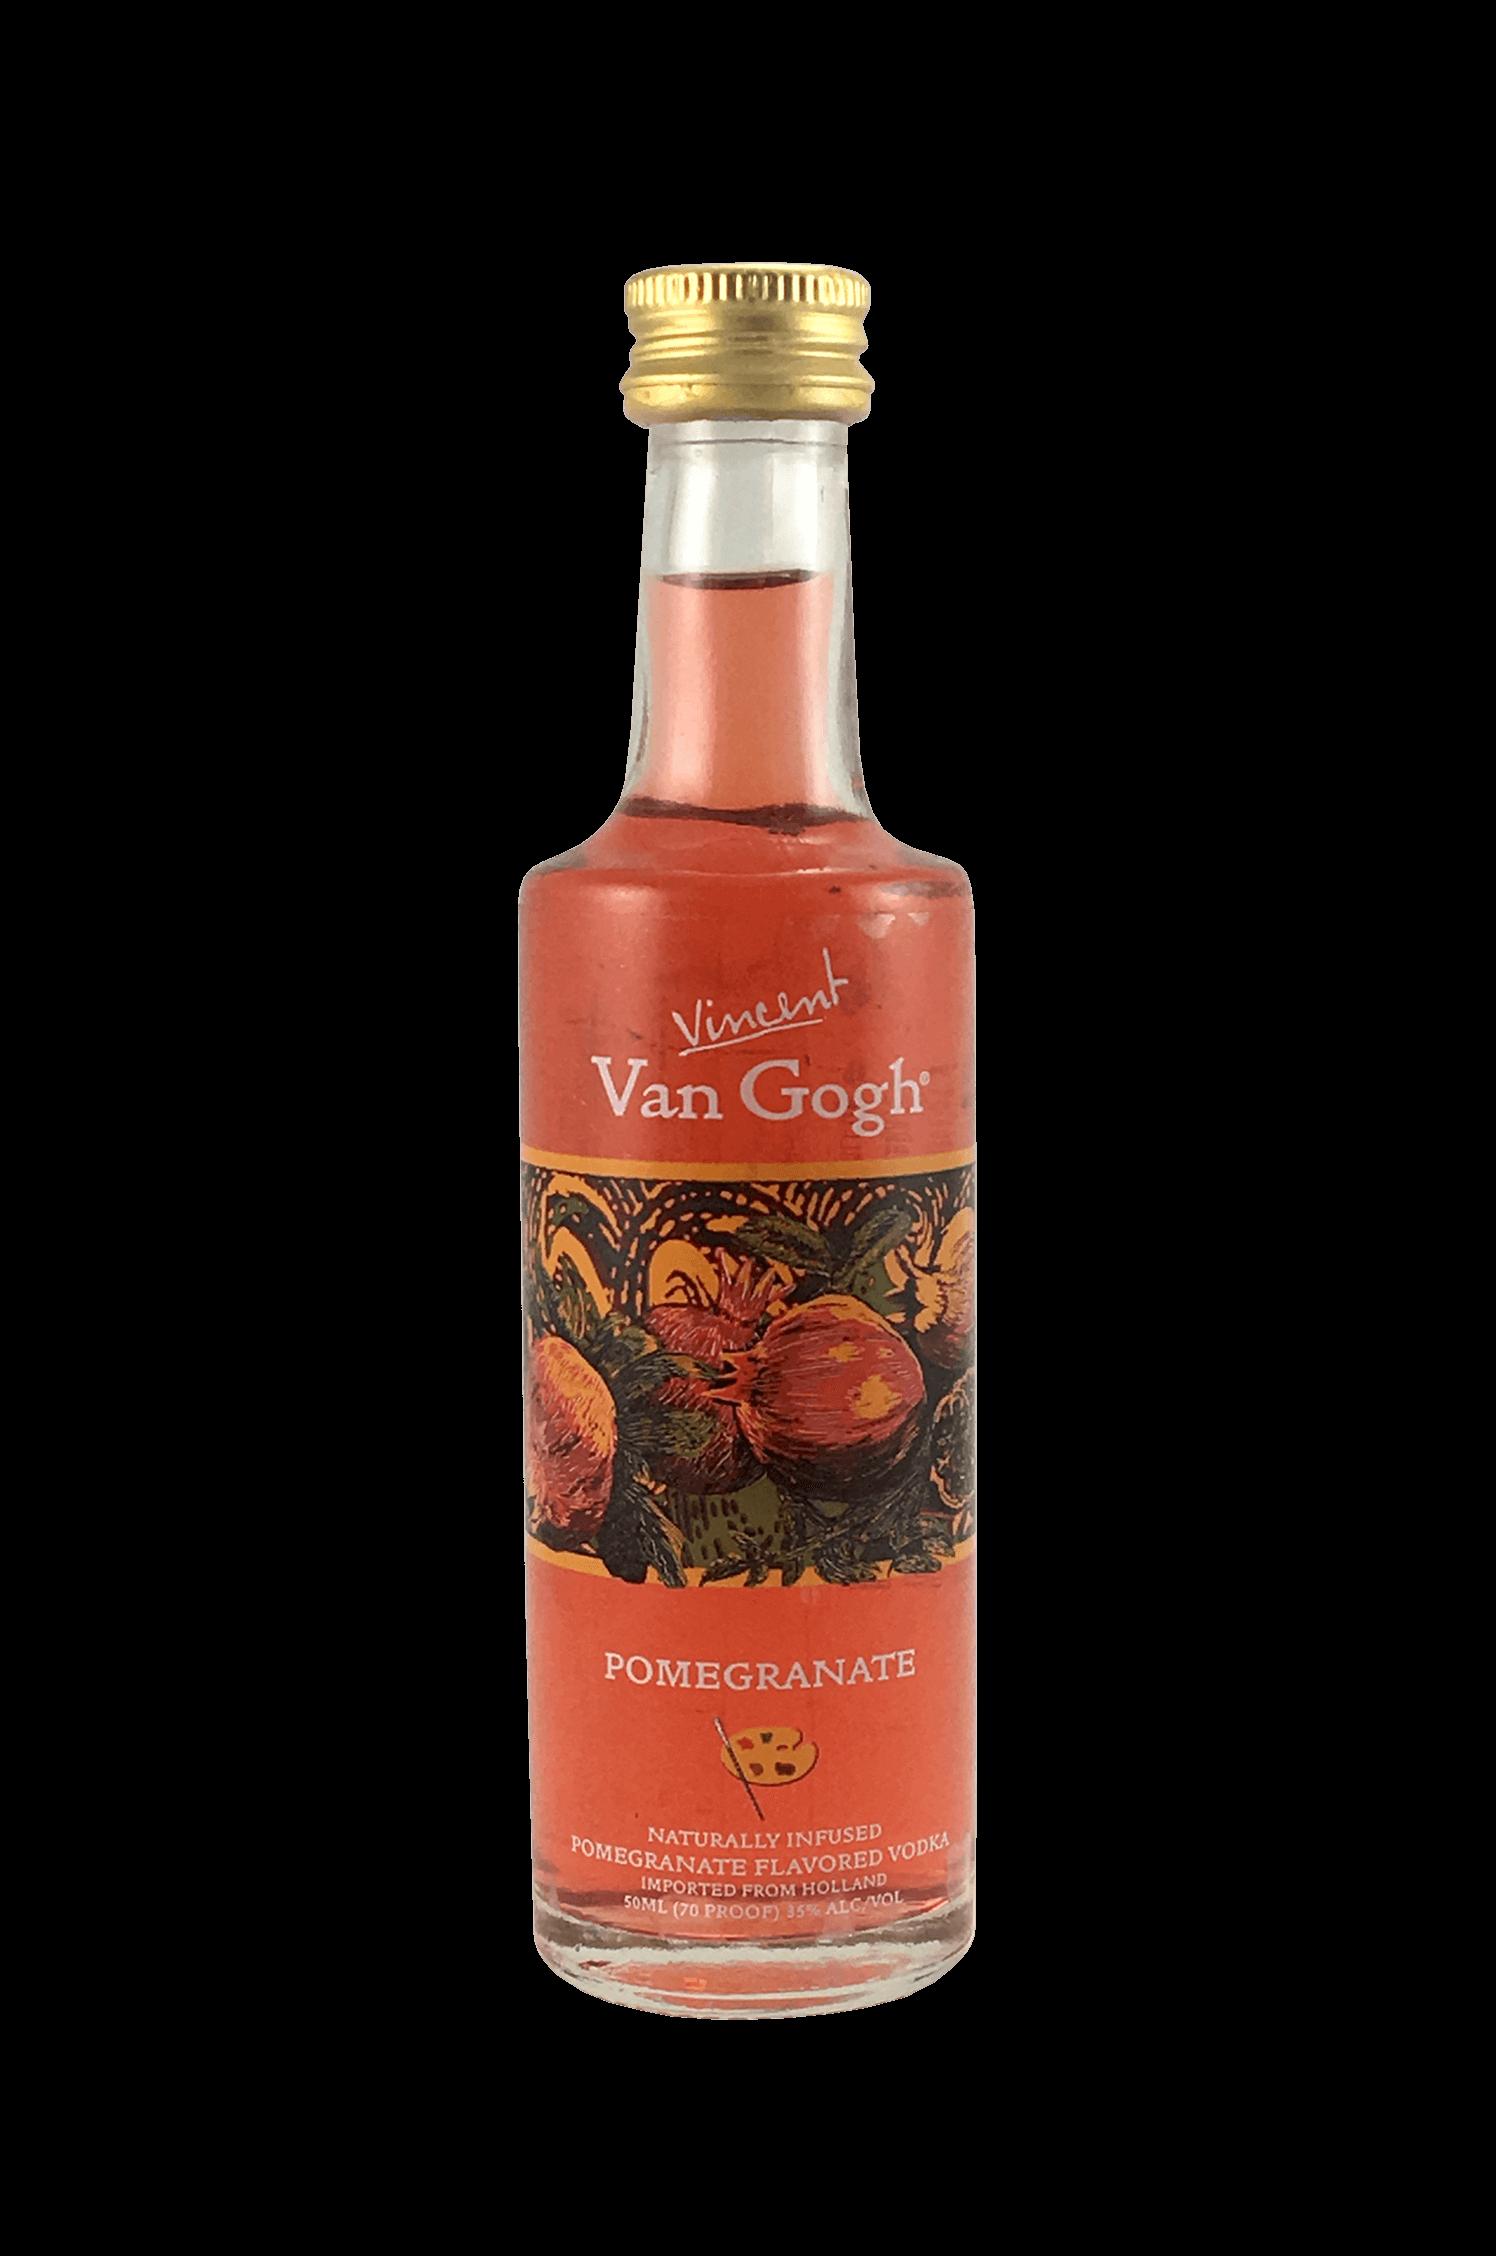 Van Gogh – Pomegranate